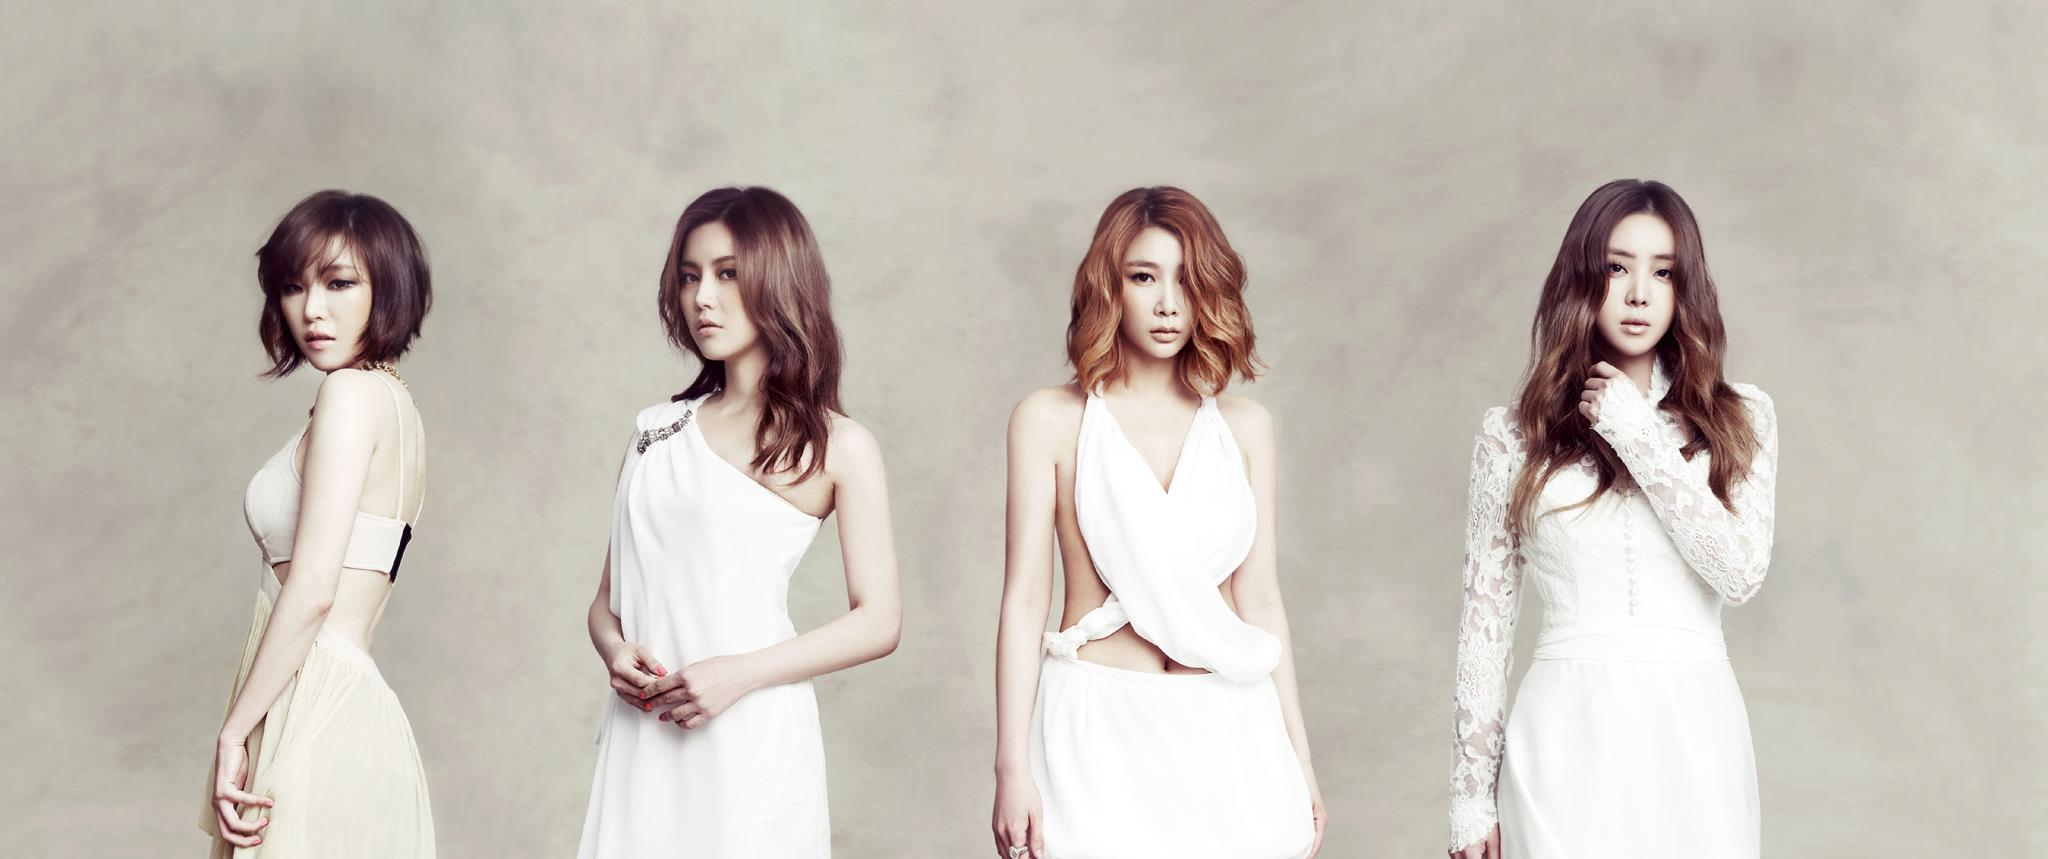 ★ Brown Eyed Girls :: 664 天 ★  藉由《Abracadabra》這首歌讓更多台灣人認識他的們的 Brown Eyed Girls,其實也是經過 664 天幾乎快兩年的努力,才因為《LOVE》得到電視台一位的肯定。